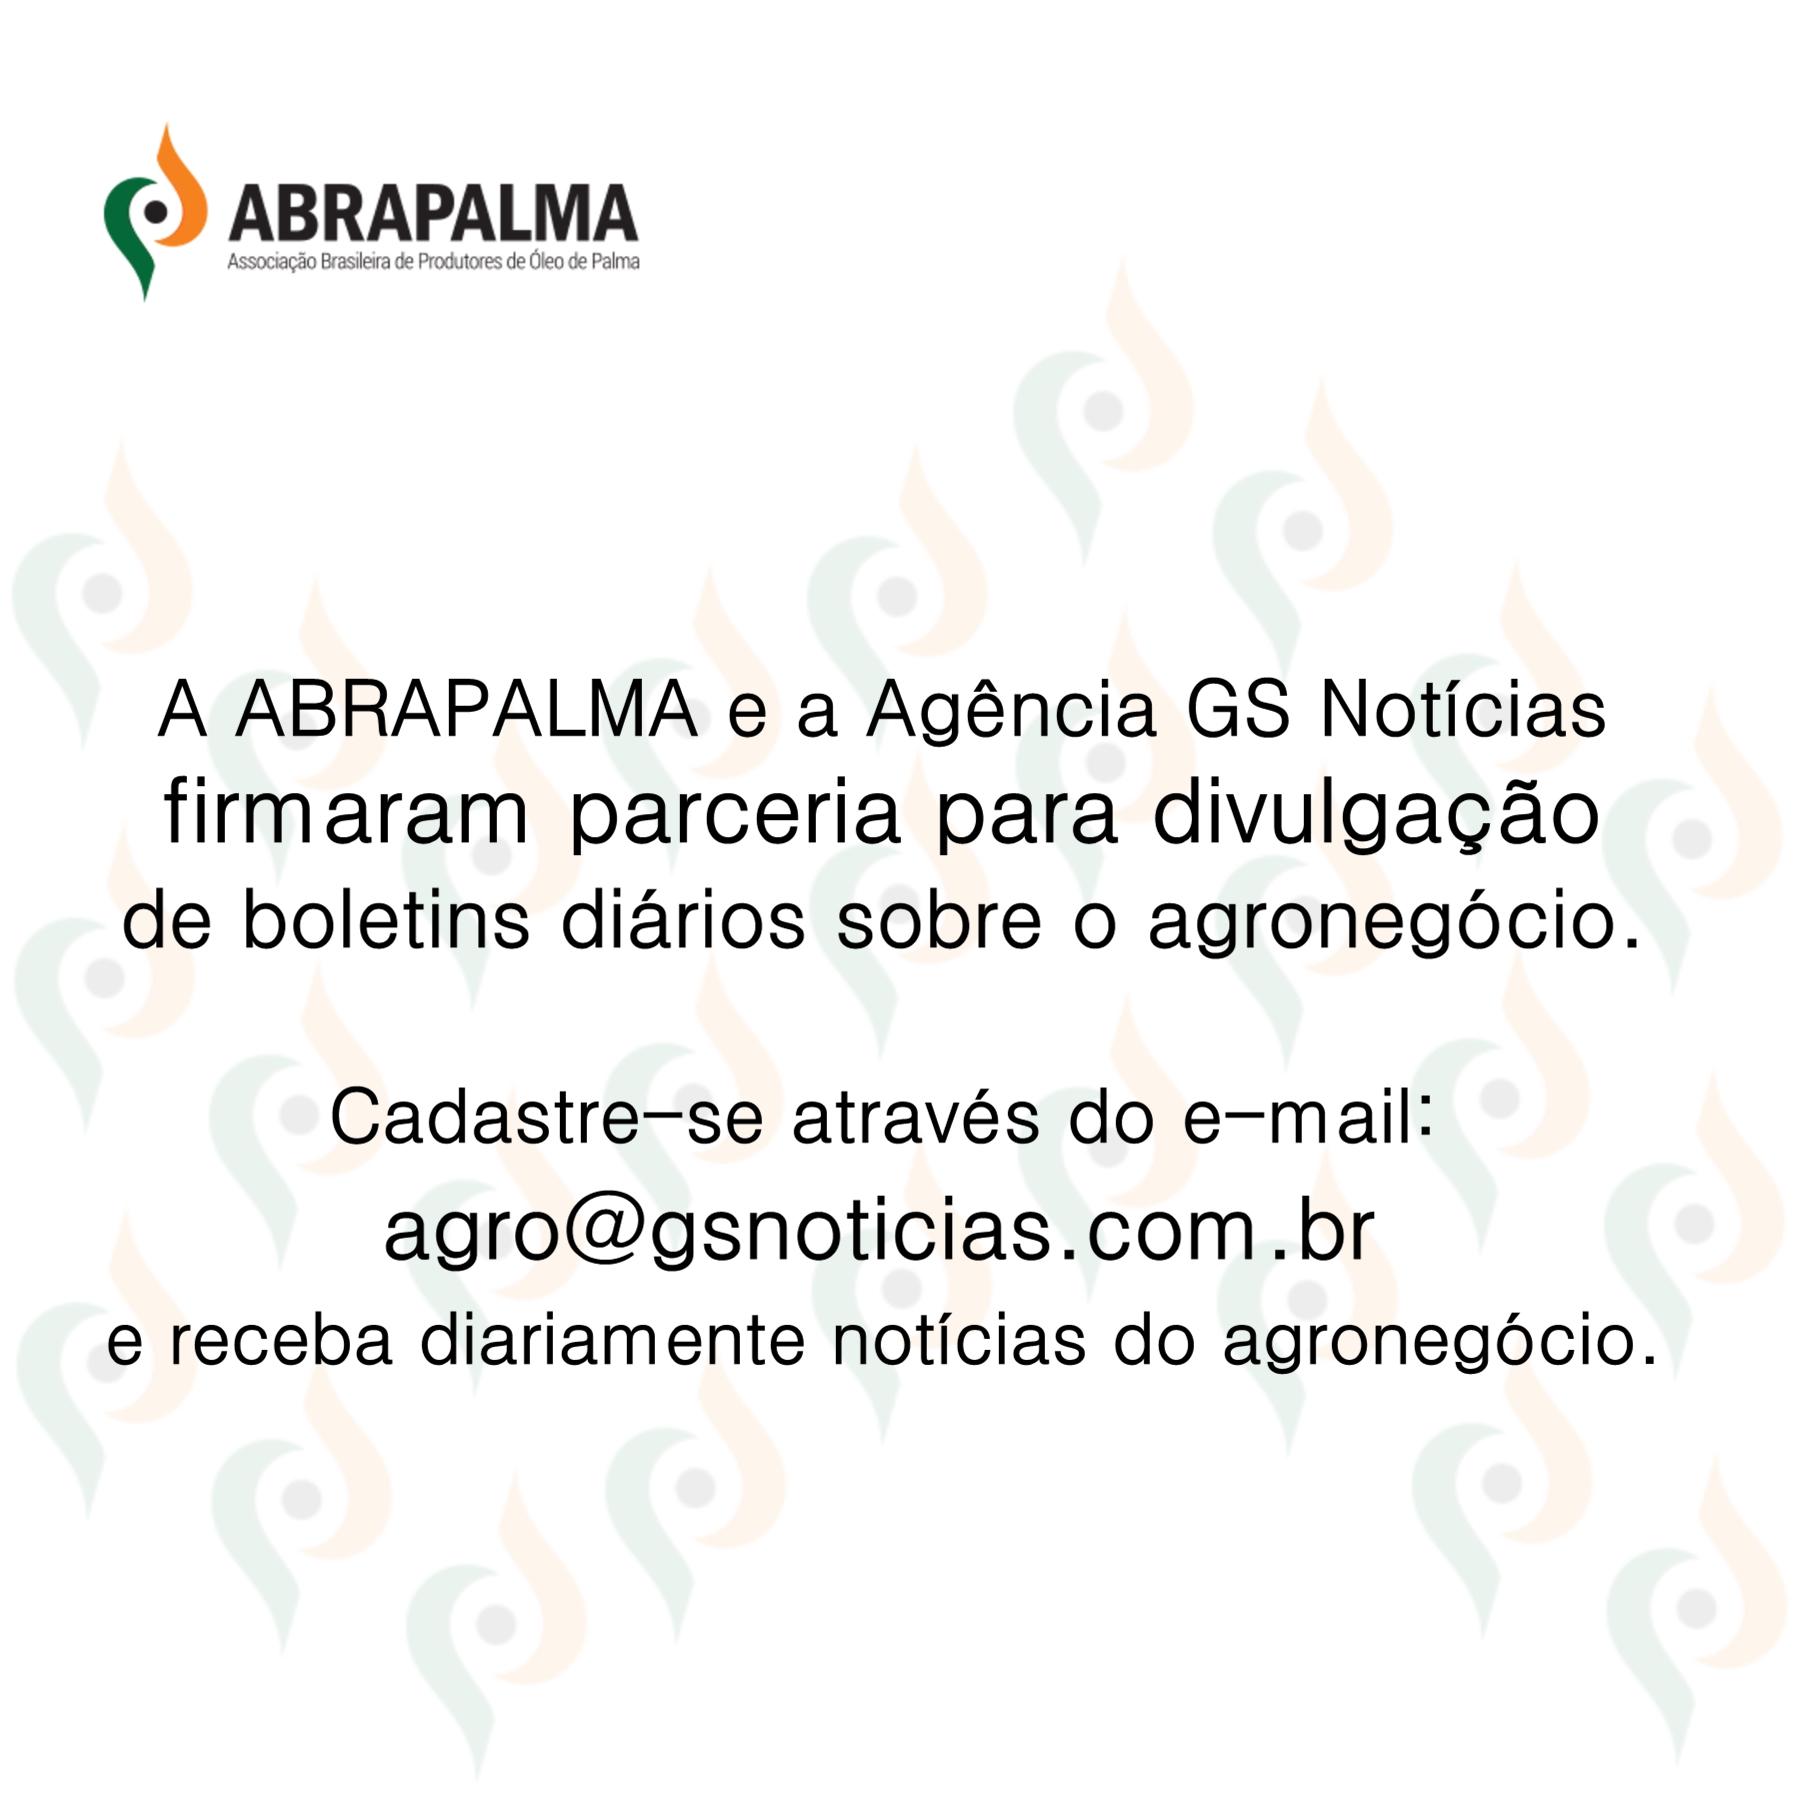 2-BANNER-MIDIAS-ABRAPALAMA-GS